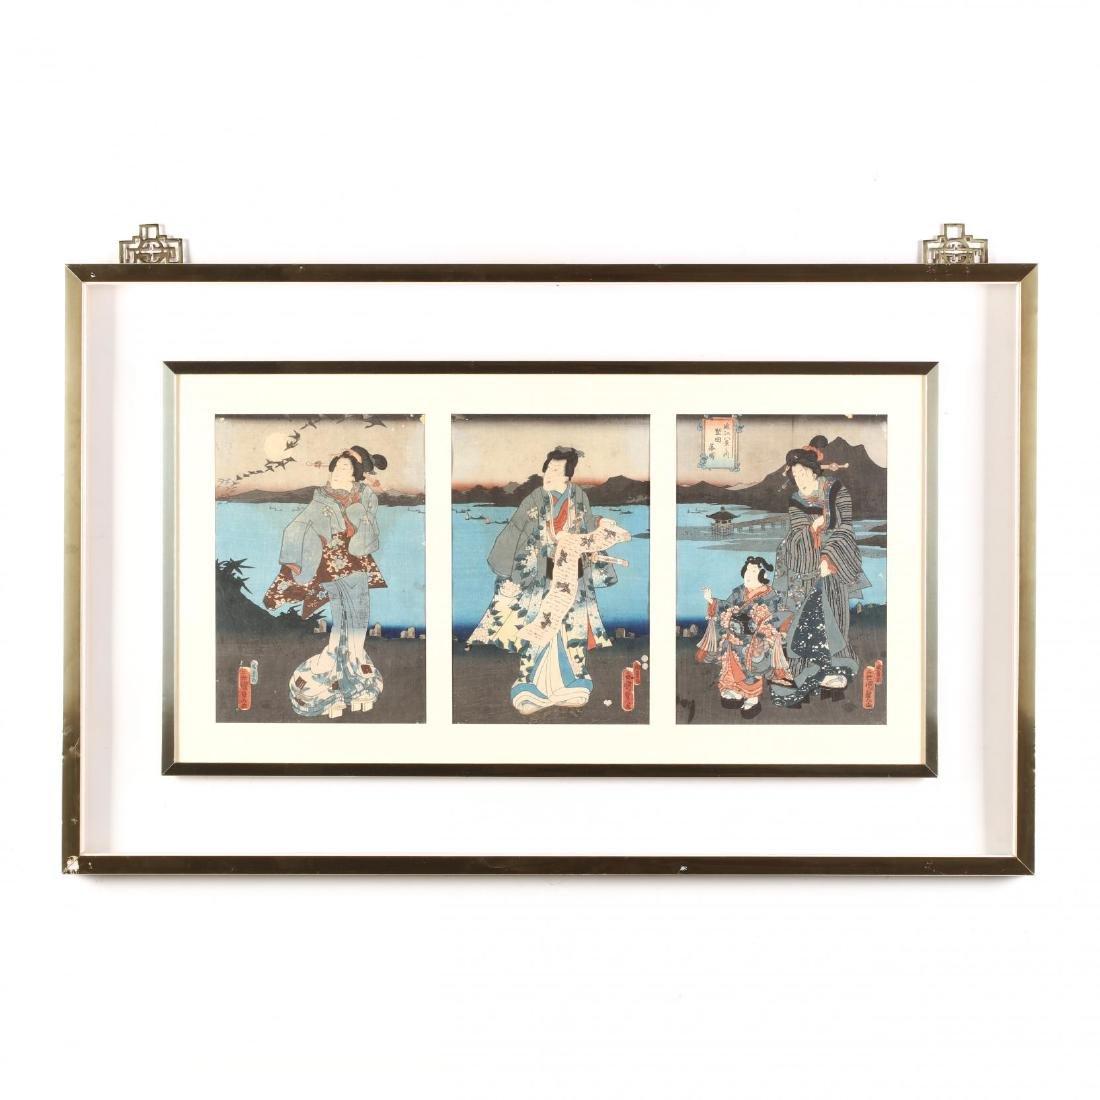 A Japanese Woodblock Print Triptych by Utagawa Kunisada